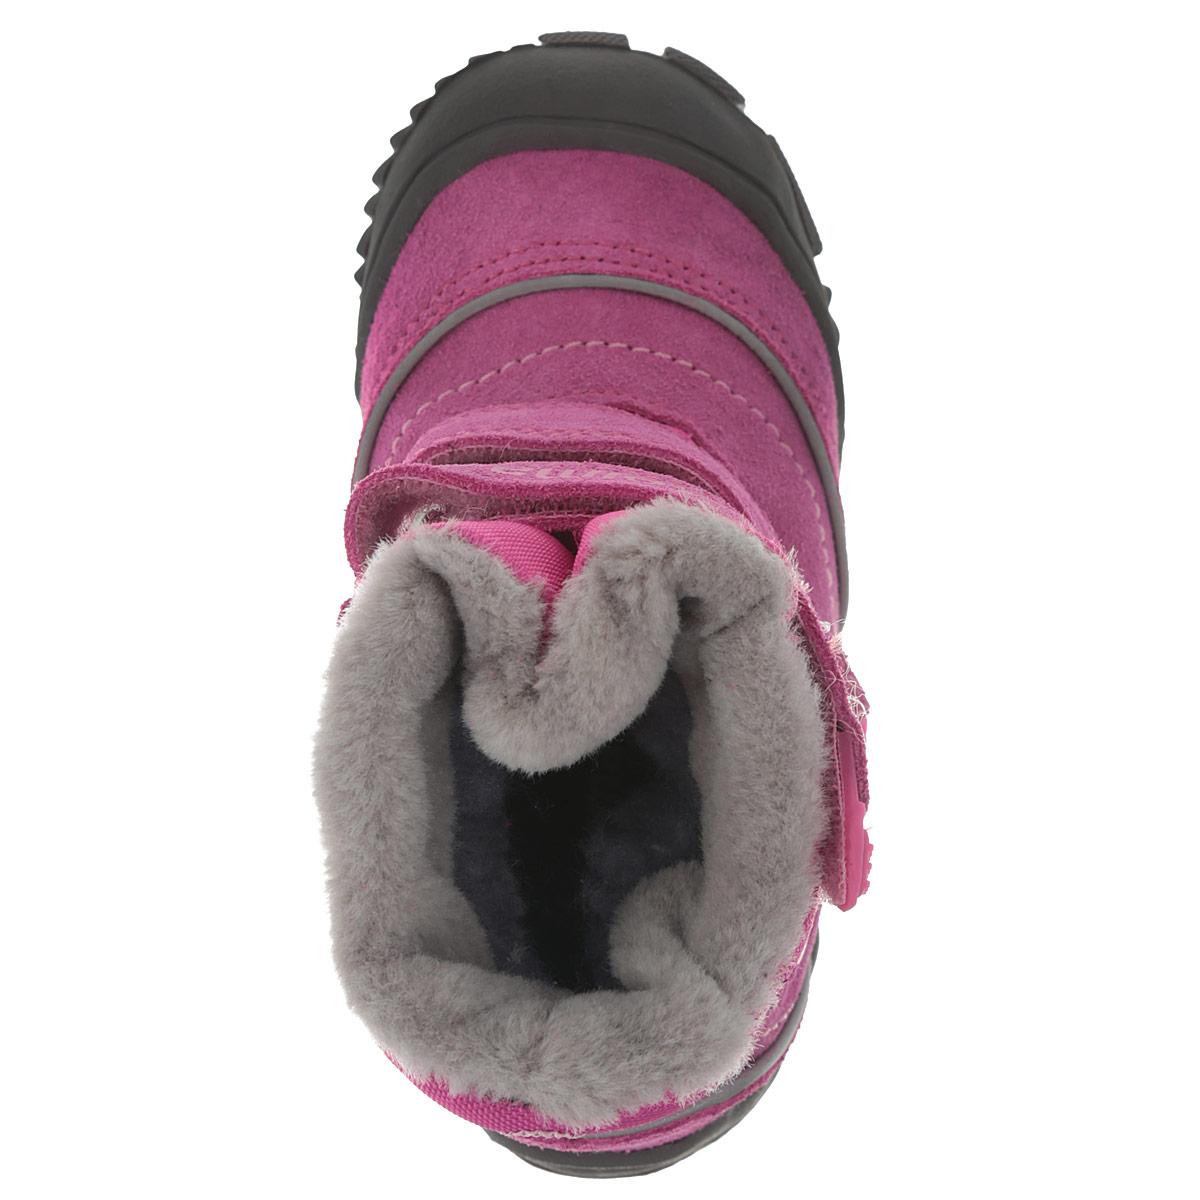 Зенден обувь официальный сайт курск каталог цены